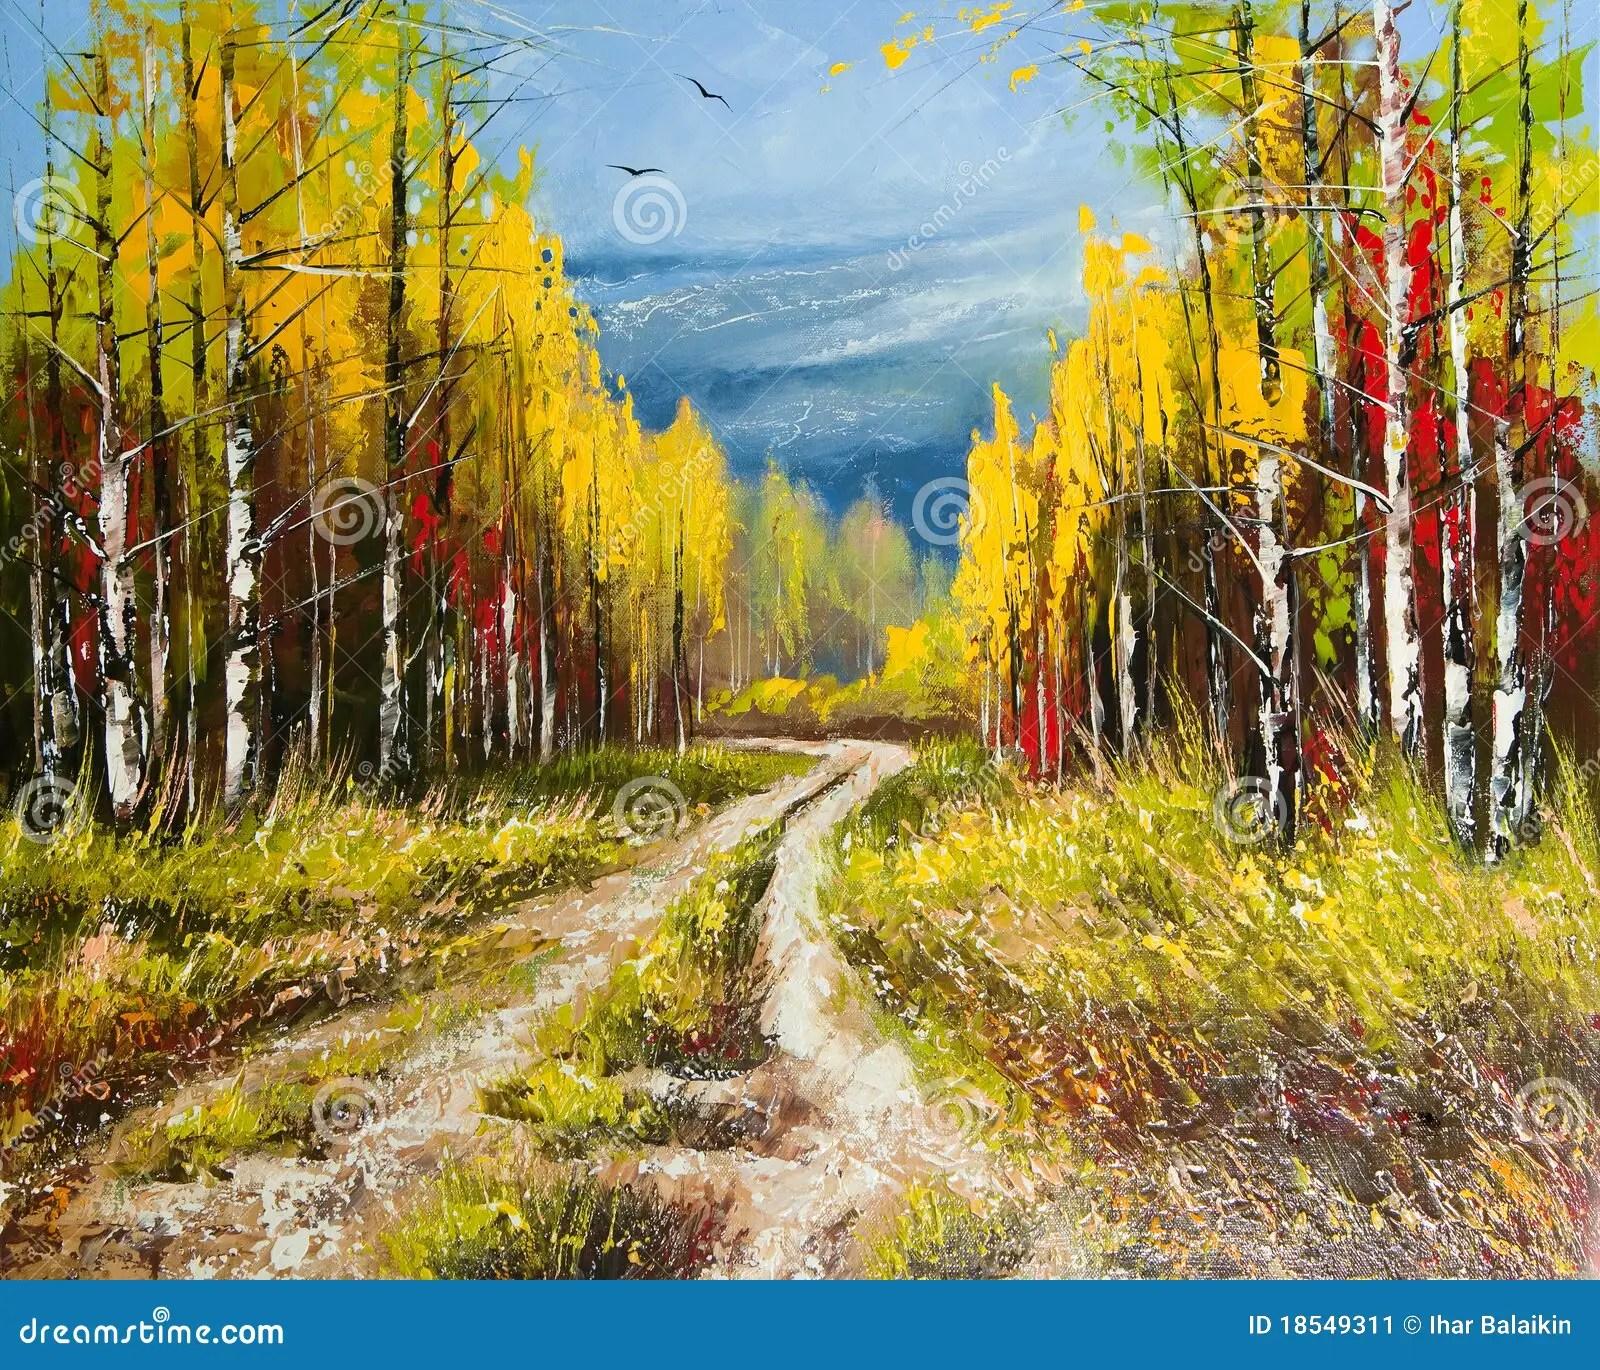 Fall Season Wallpaper Oil Painting Gold Autumn Stock Image Image 18549311